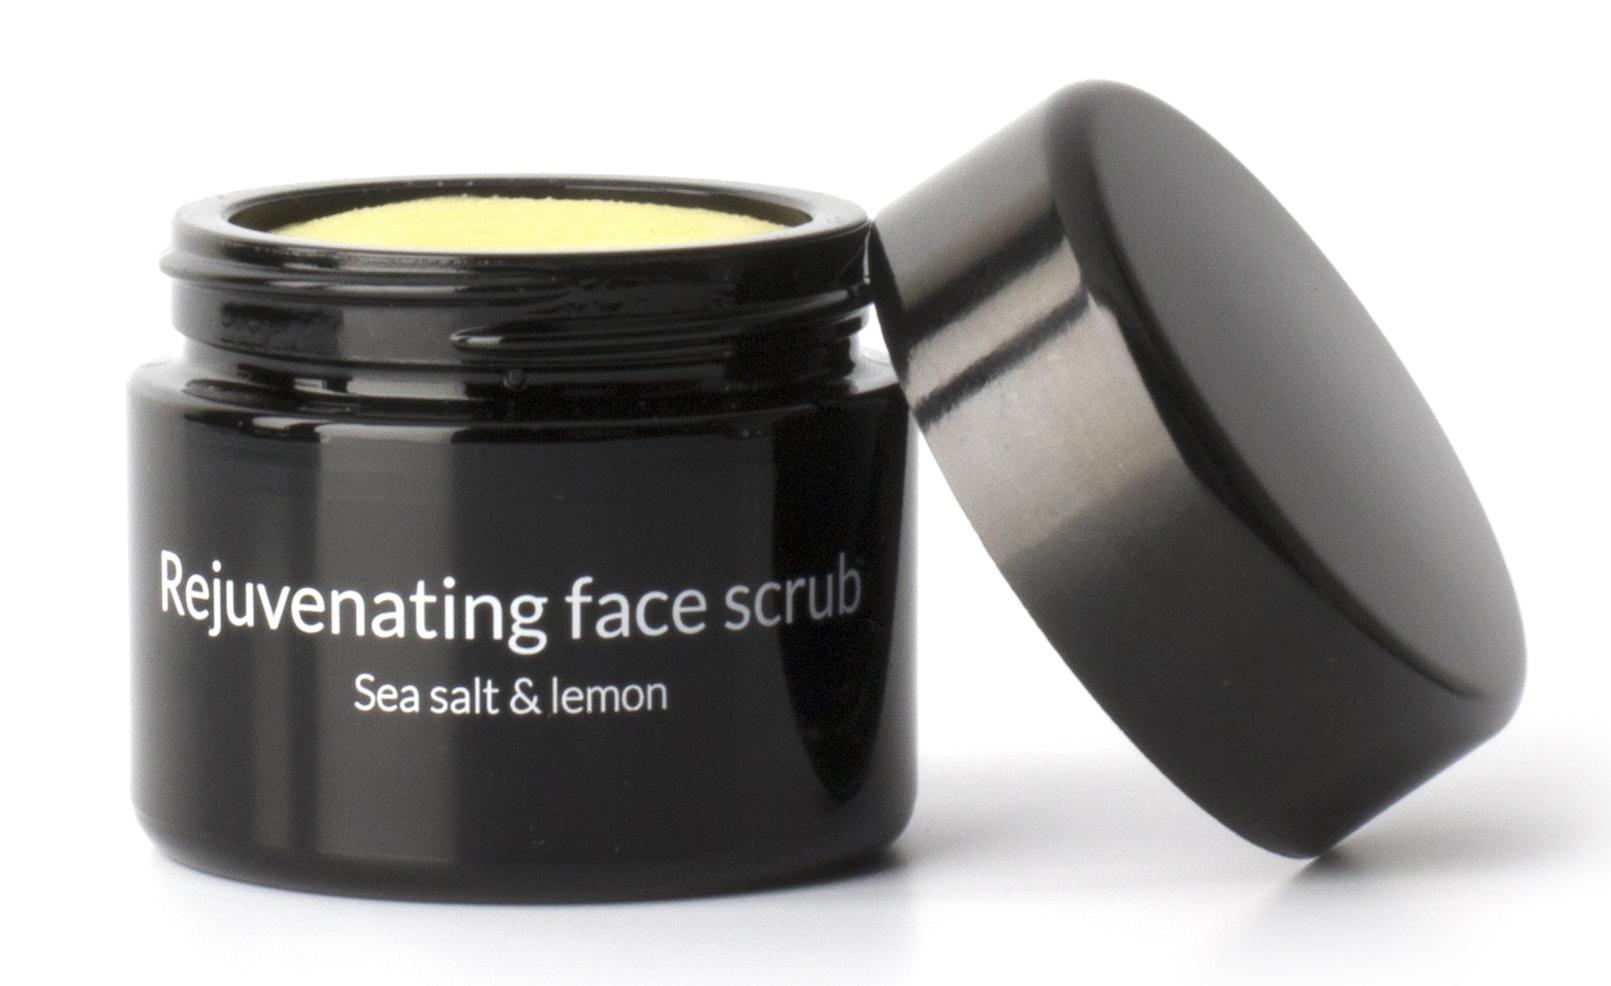 bottega organica rejuvenating face scrub lemon sea. Black Bedroom Furniture Sets. Home Design Ideas